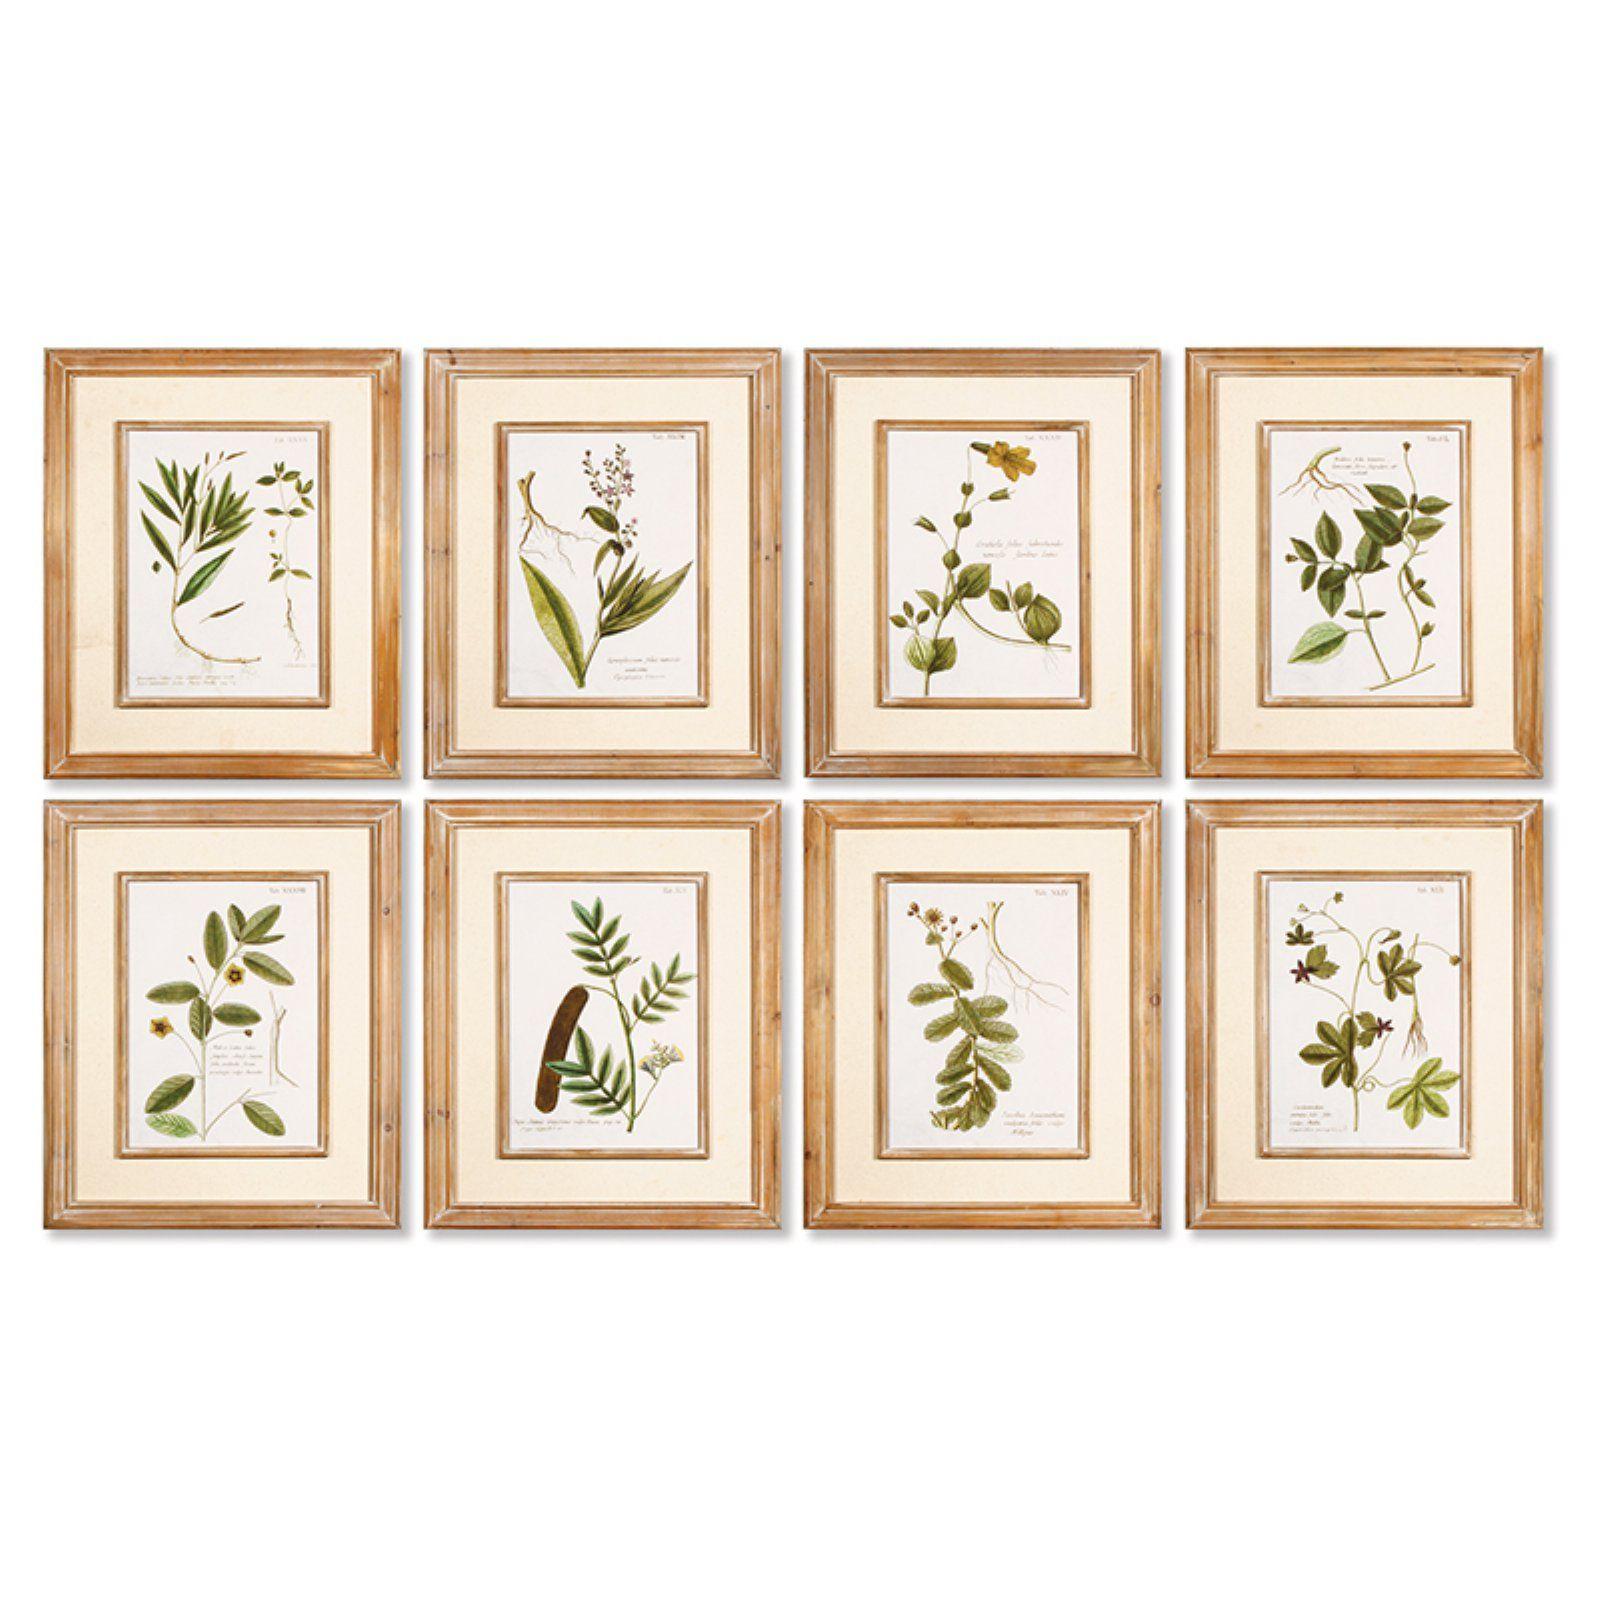 Napa Home and Garden 8 Piece Spring Botanical Print Wall